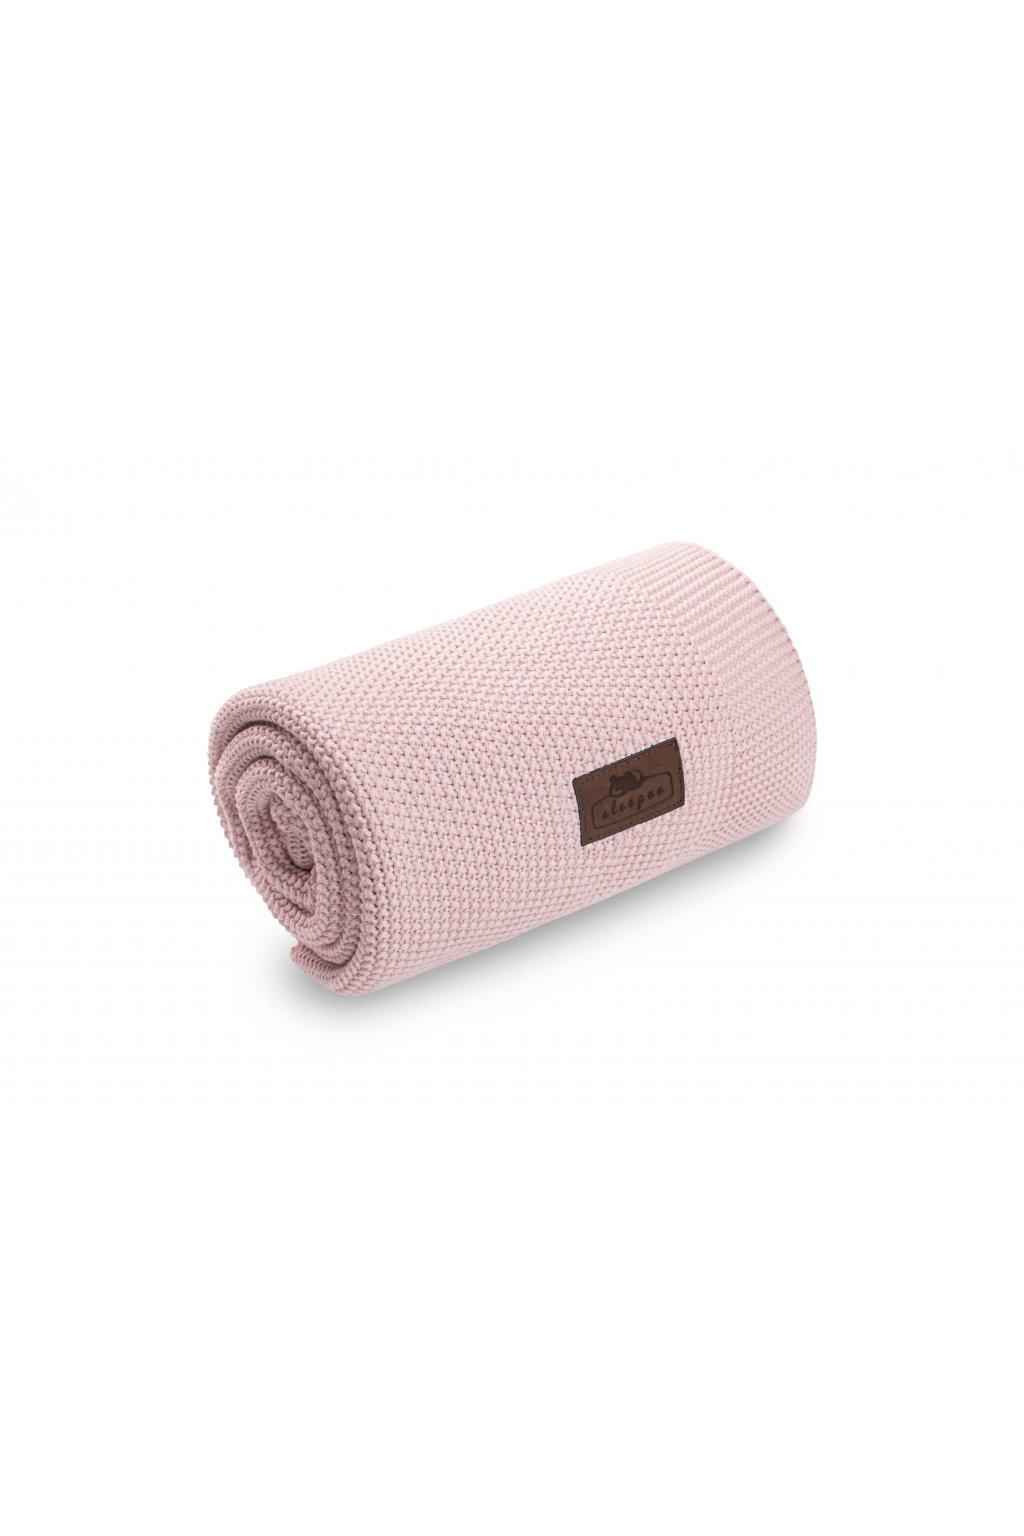 Bambusová deka Sleepee Bamboo Touch Blanket růžová